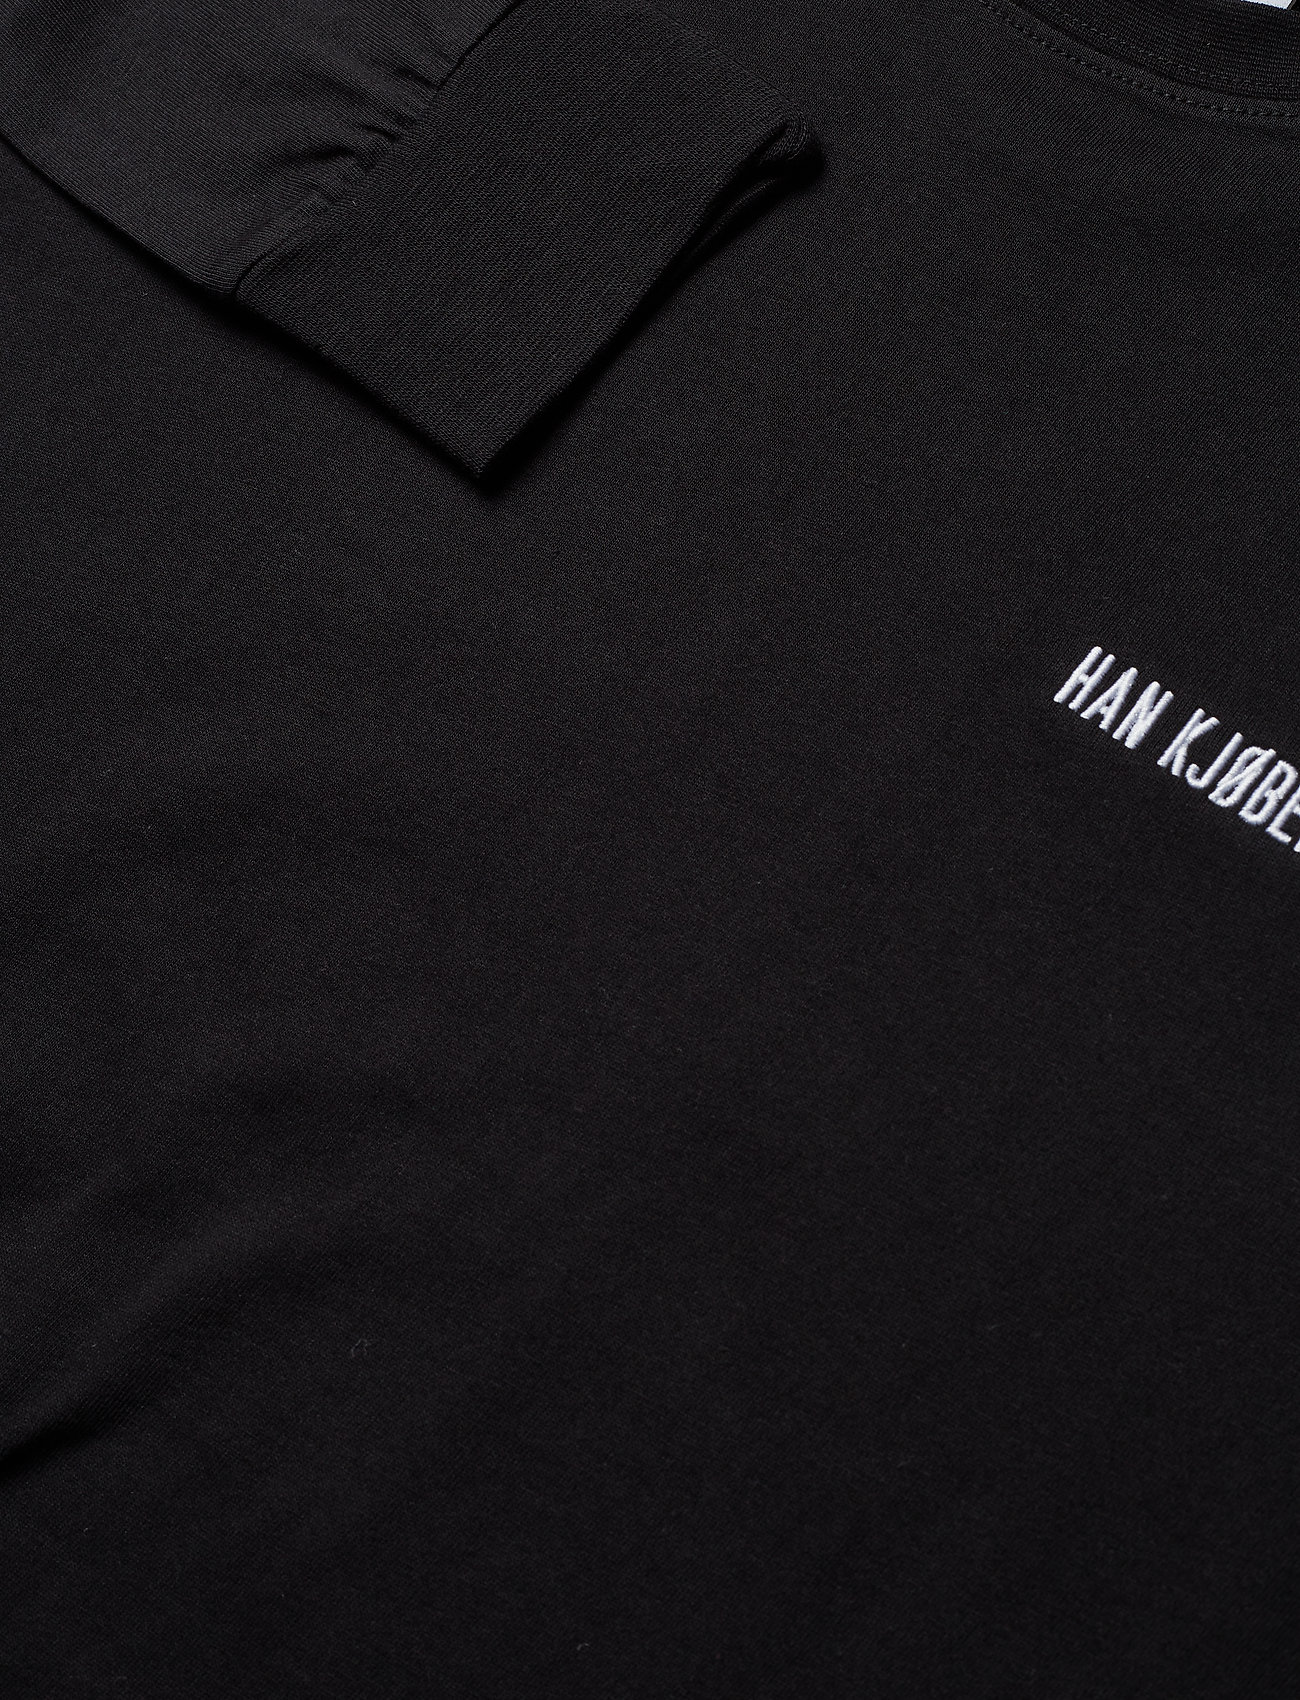 HAN Kjøbenhavn - Casual Long Sleeve Tee - basic t-shirts - black logo - 4